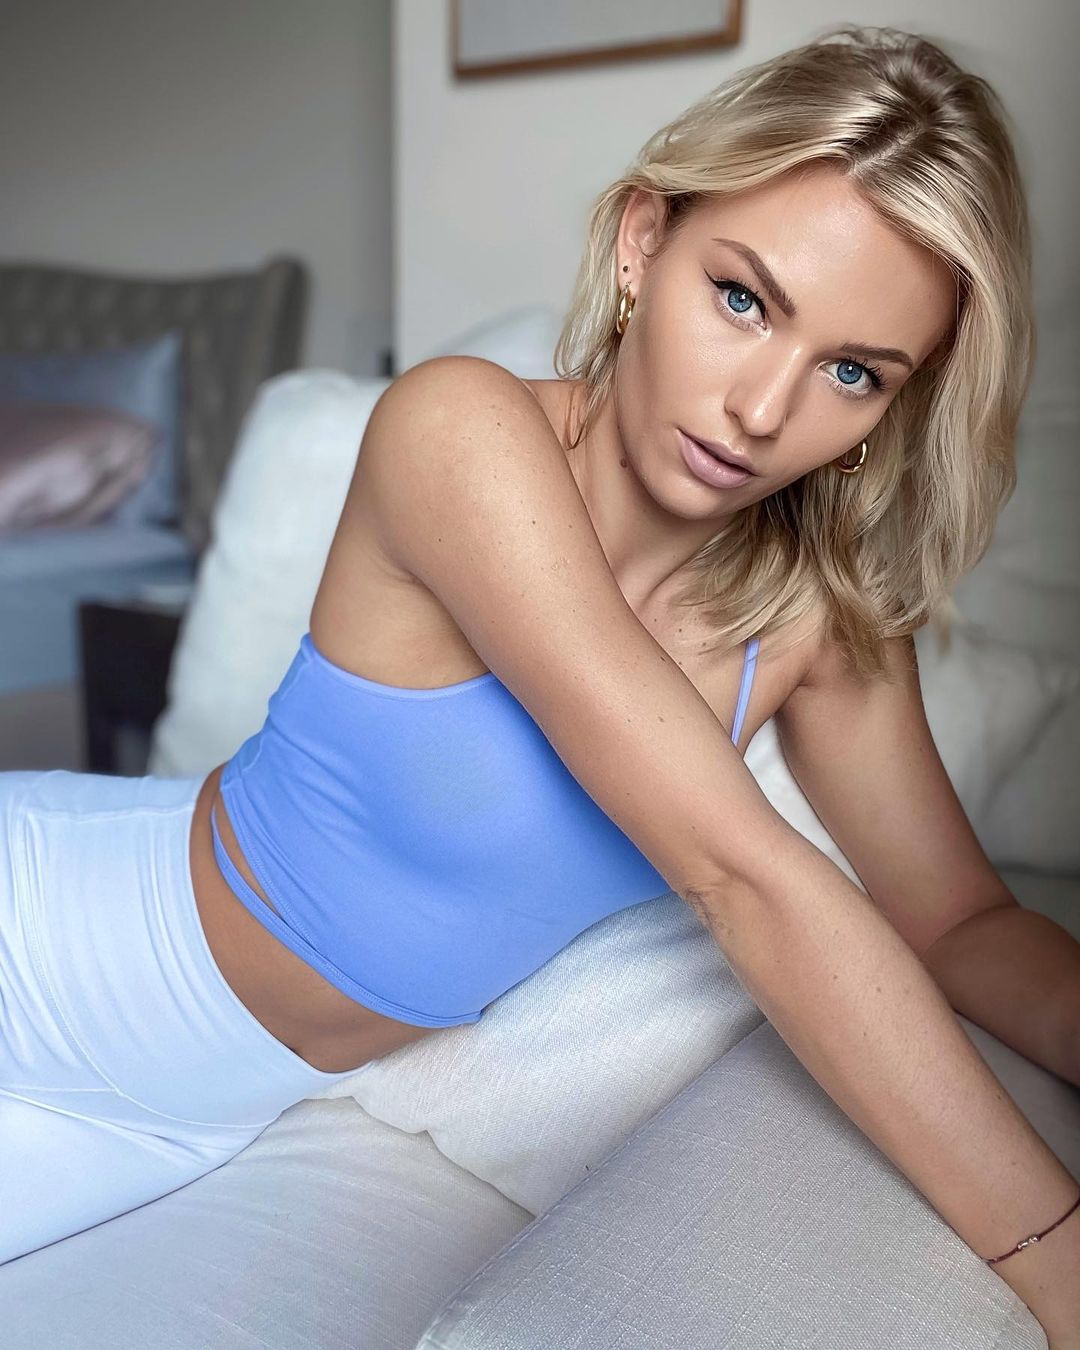 Revelan fotos de Irina Baeva antes de sus cirugías plásticas